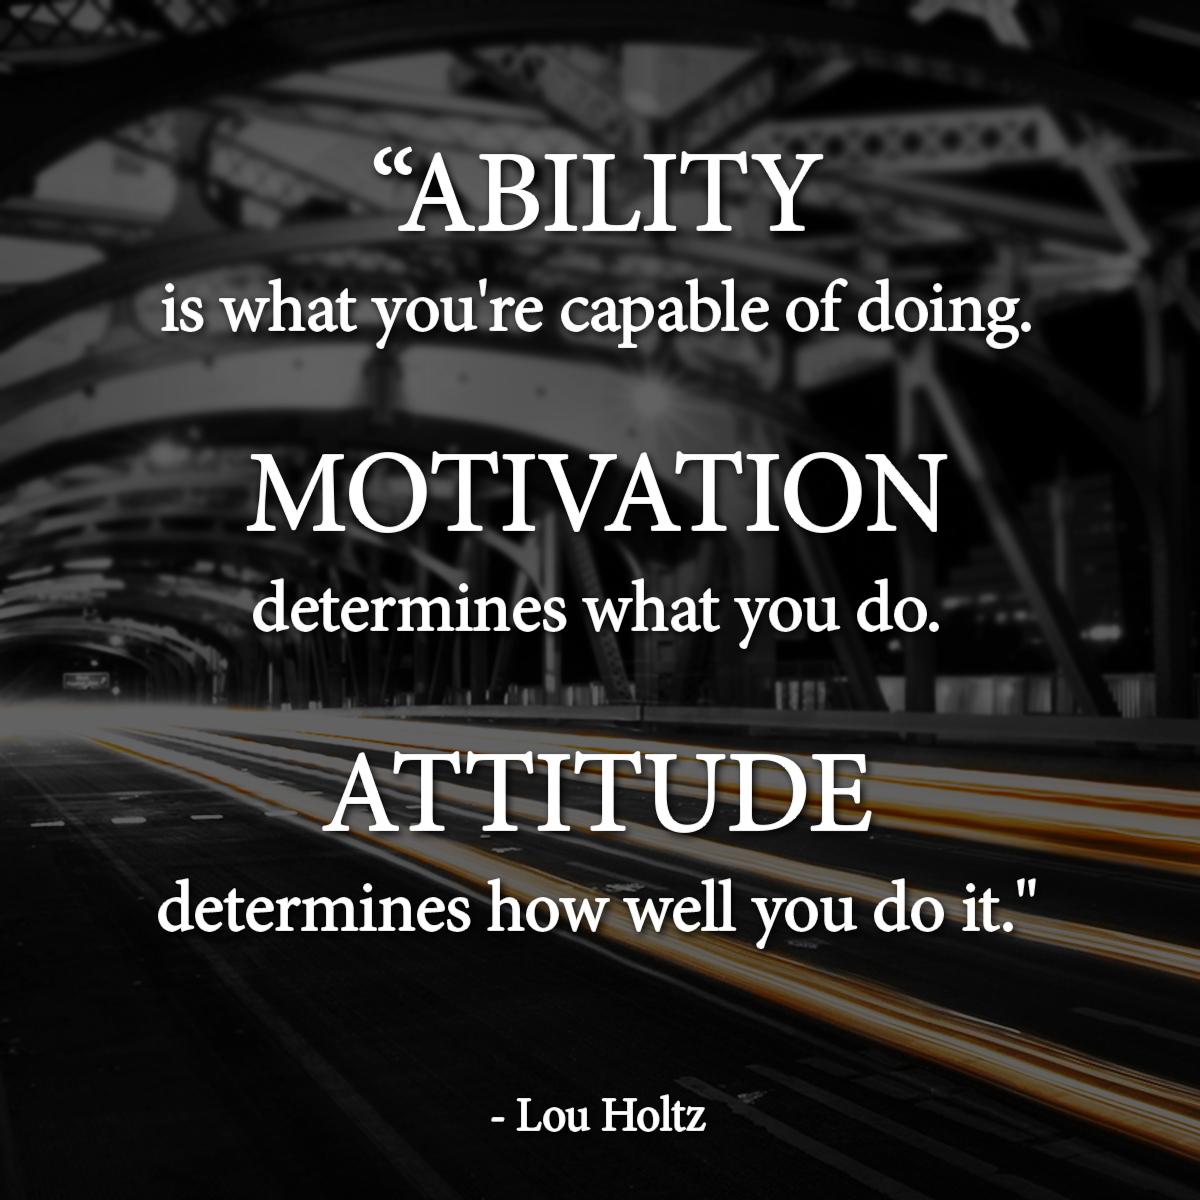 Copyright Free Inspirational Quotes Quotesgram: Inspirational Coaching Quotes. QuotesGram